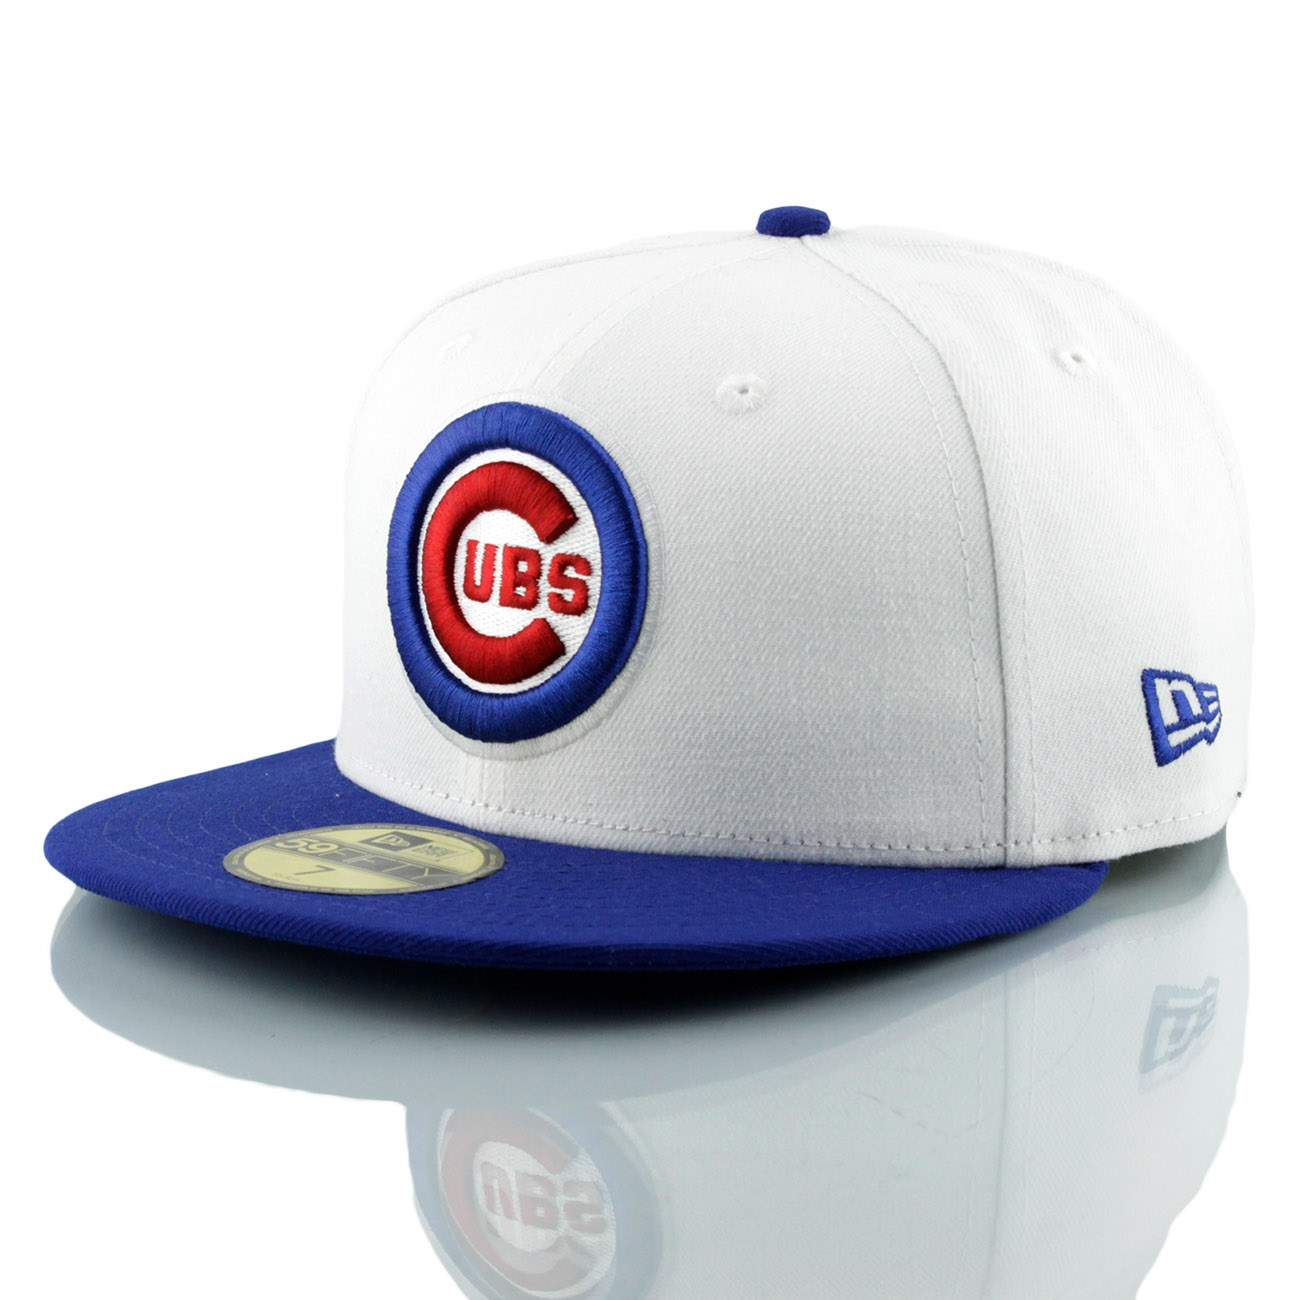 best service 6e8b6 70af3 New Era Chicago Cubs White Top 59FIFTY Fitted MLB Cap   TAASS.com Fanshop